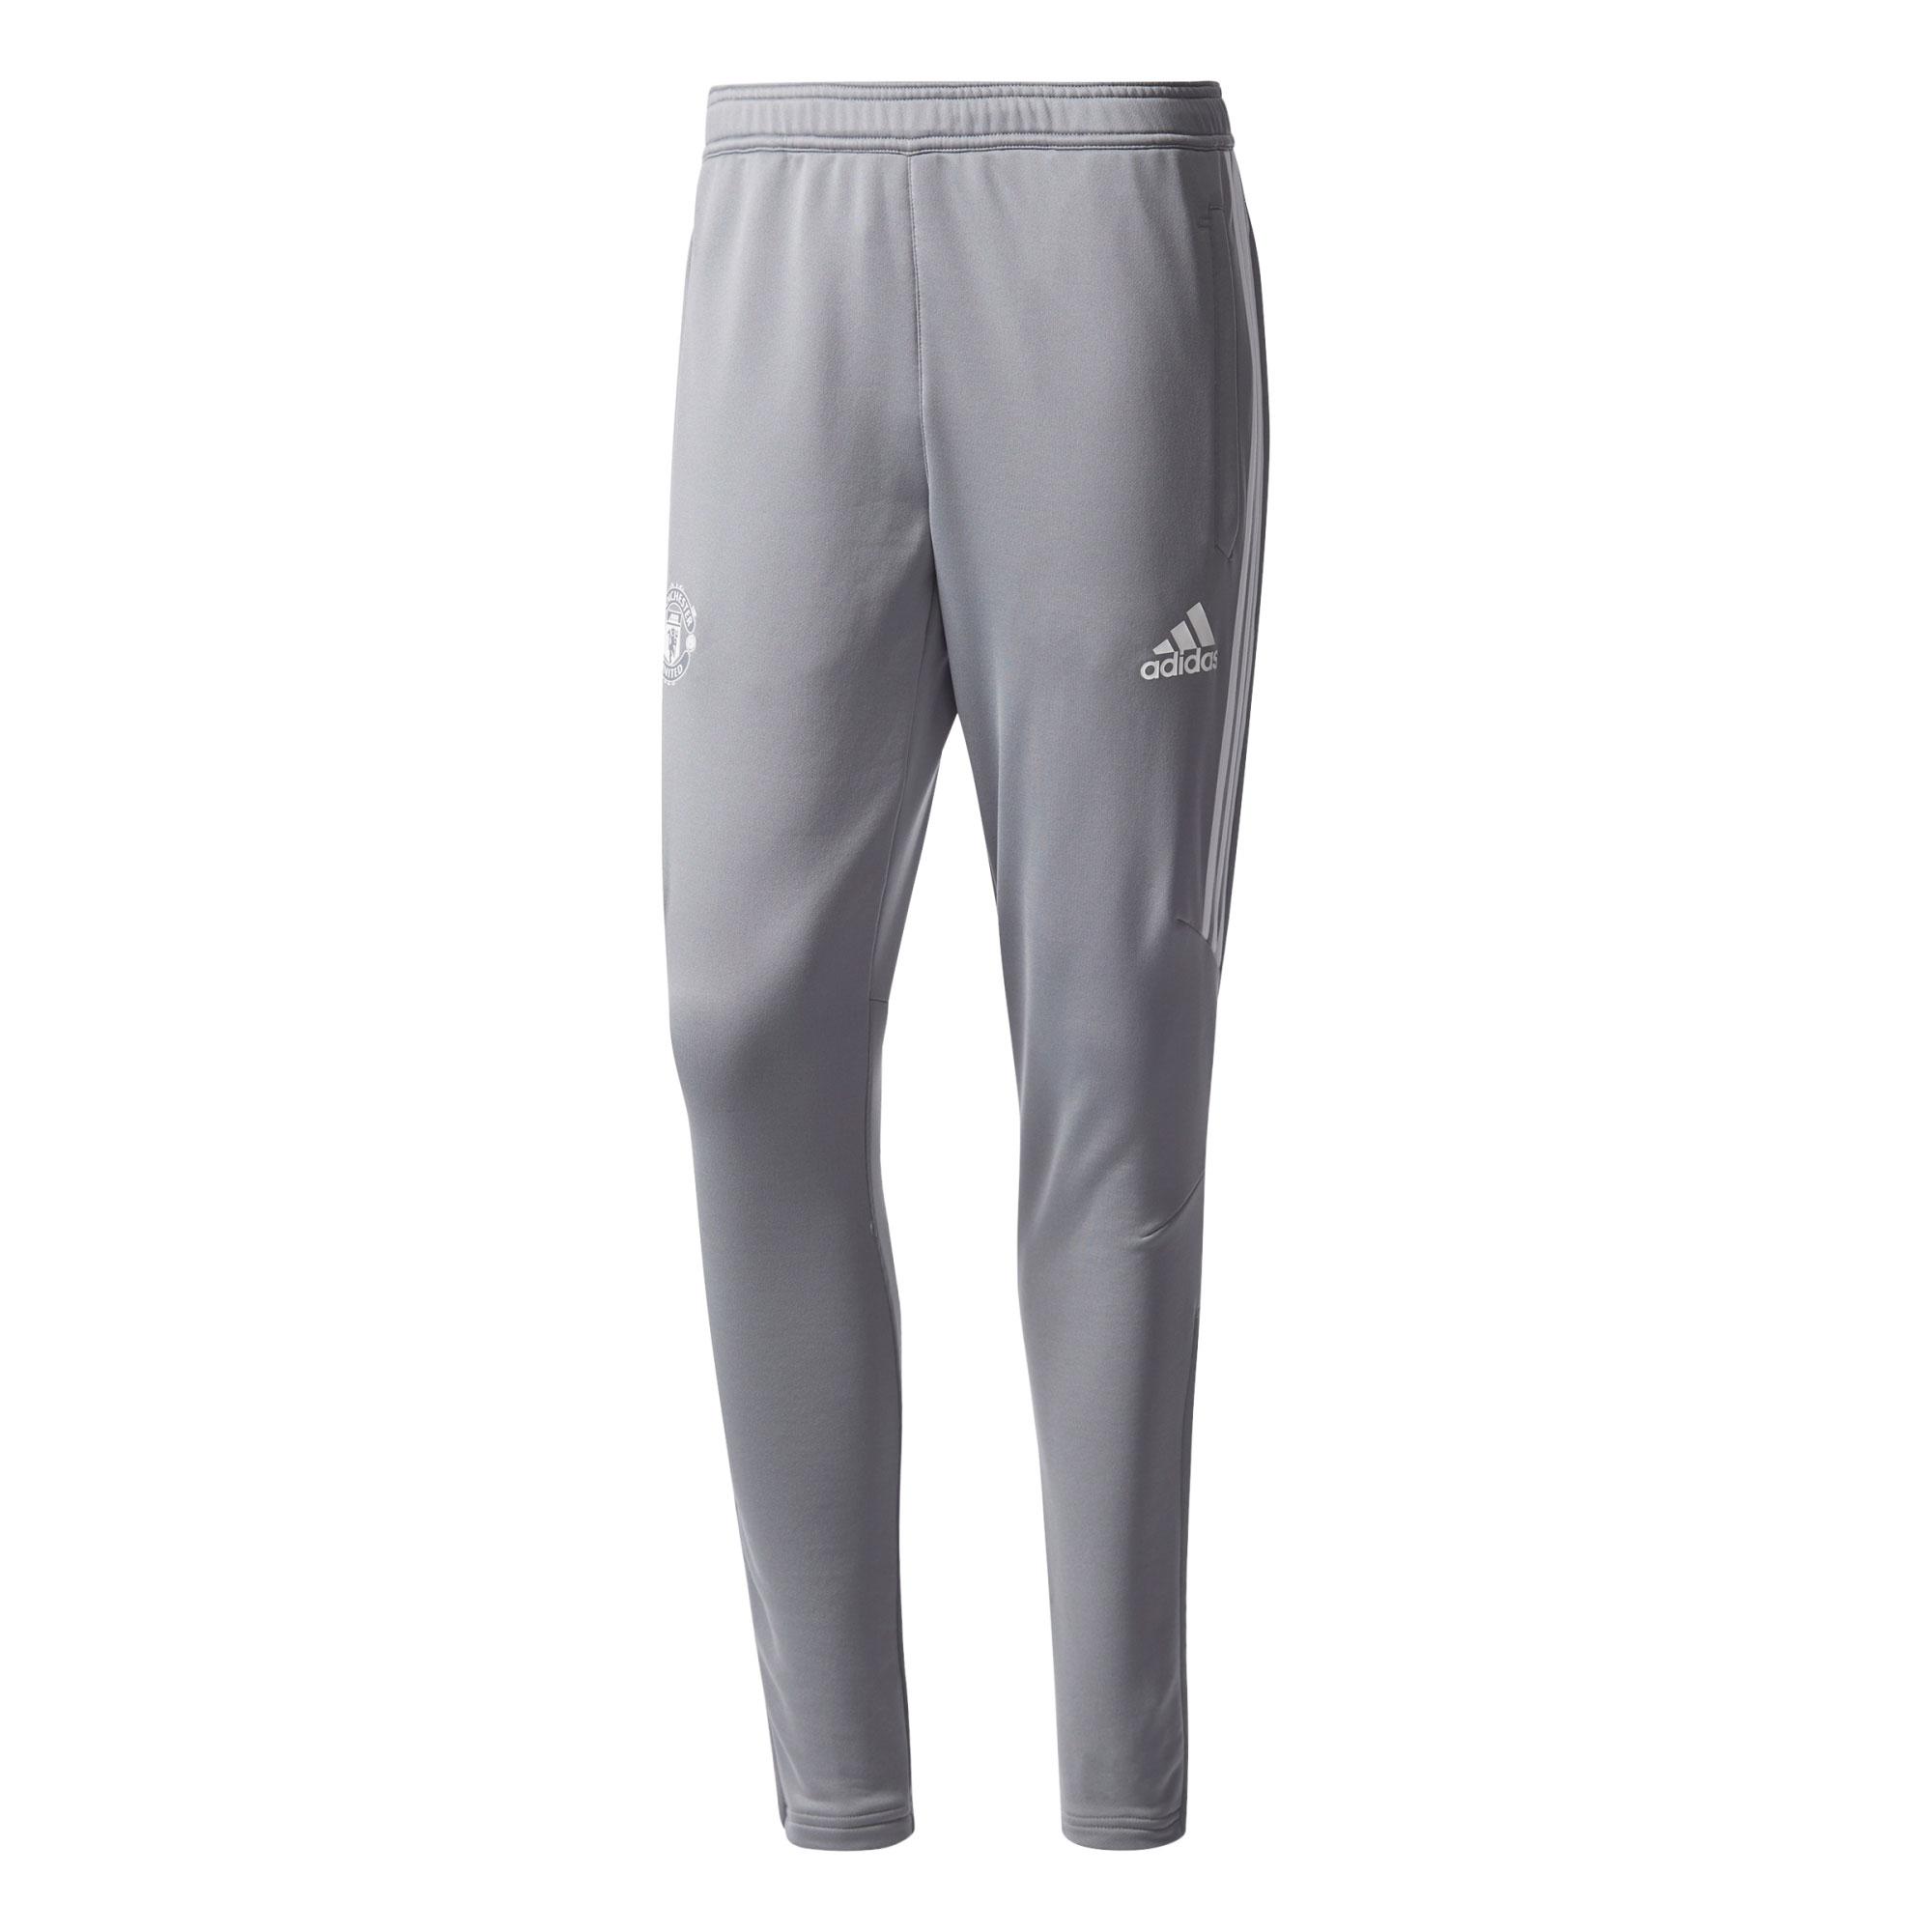 Manchester United Training Pant - Grey